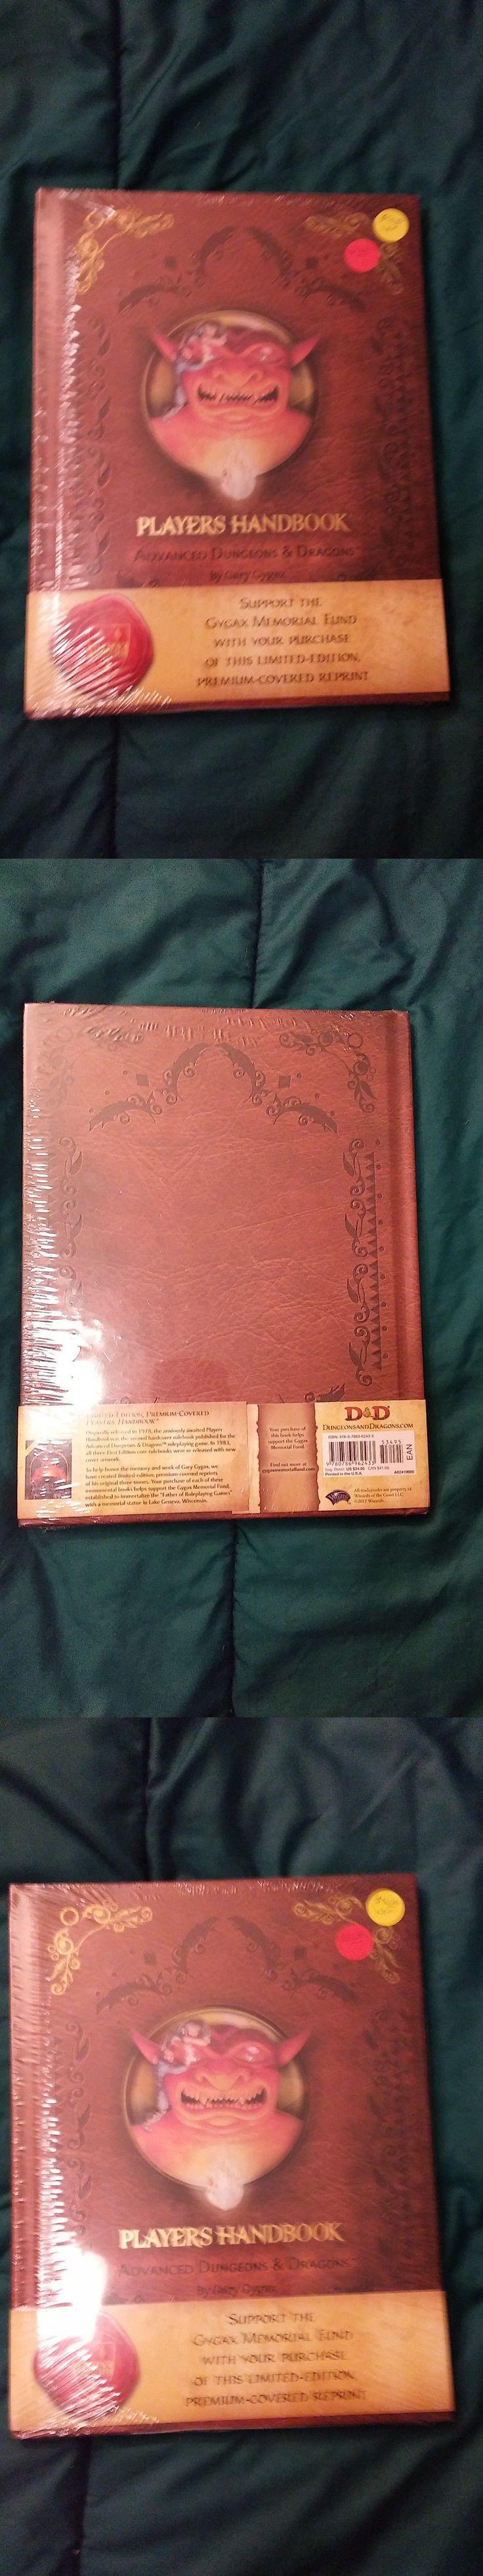 Players Handbooks 158712: Dandd Adandd Premium Players Handbook Hardcover Limited Sealed 2012 Gygax Fund -> BUY IT NOW ONLY: $47.99 on eBay!